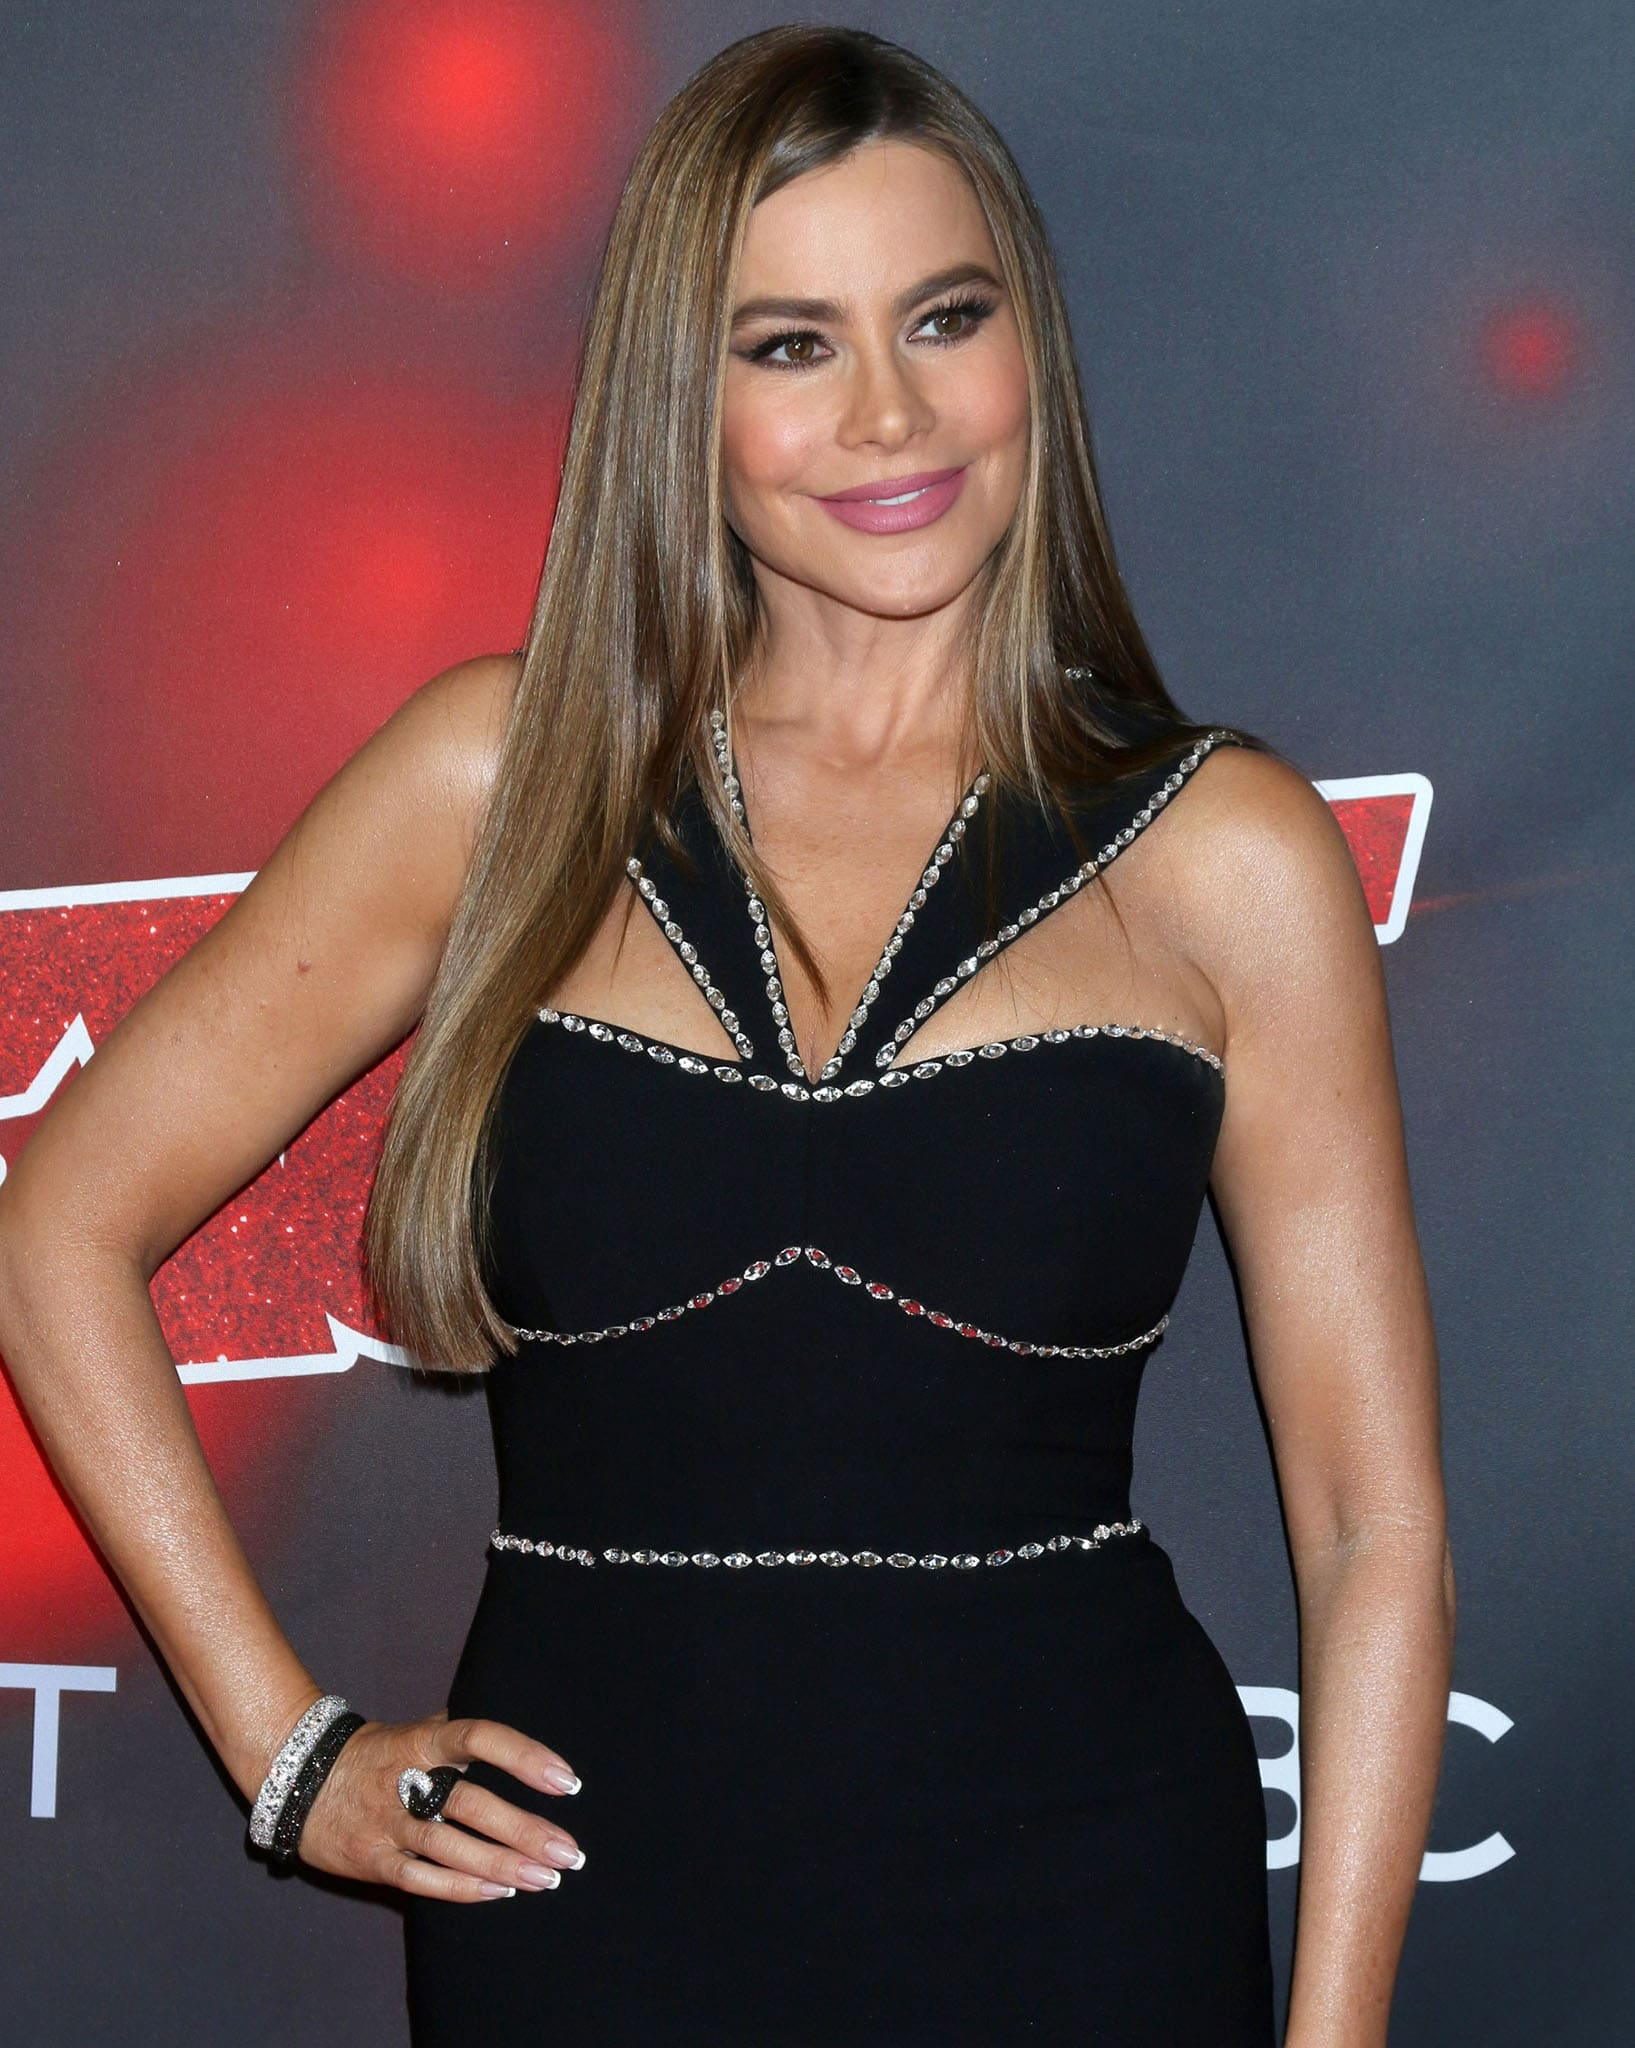 Sofia Vergara styles her hair sleek straight and wears subtle smokey eyeshadow with mauve lipstick